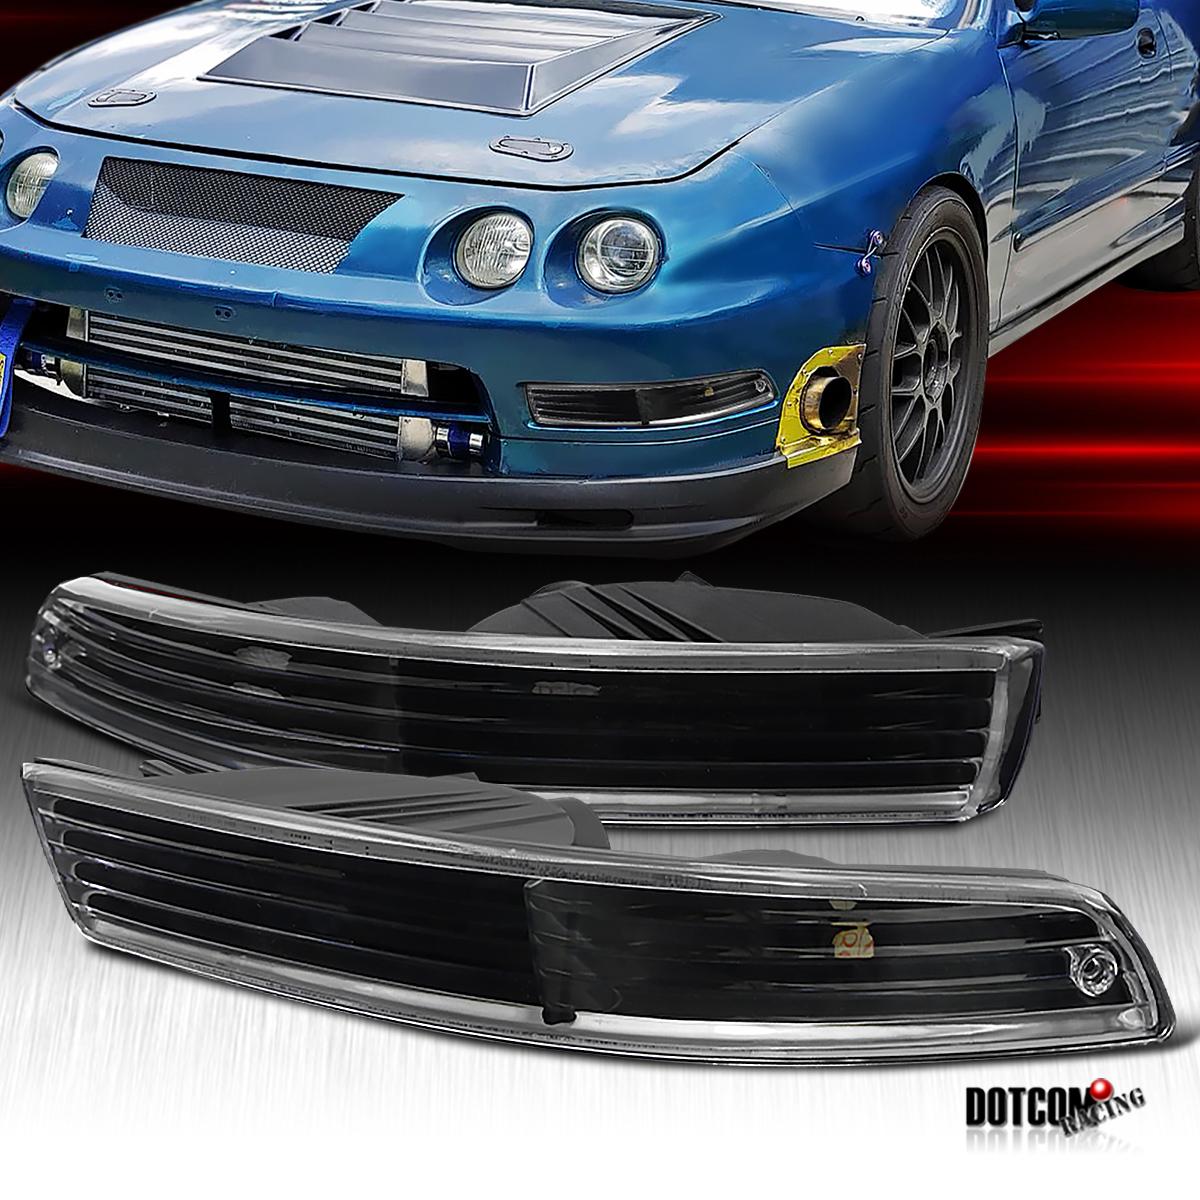 94-97 Acura Integra JDM Black Bumper Signal Light Lamps